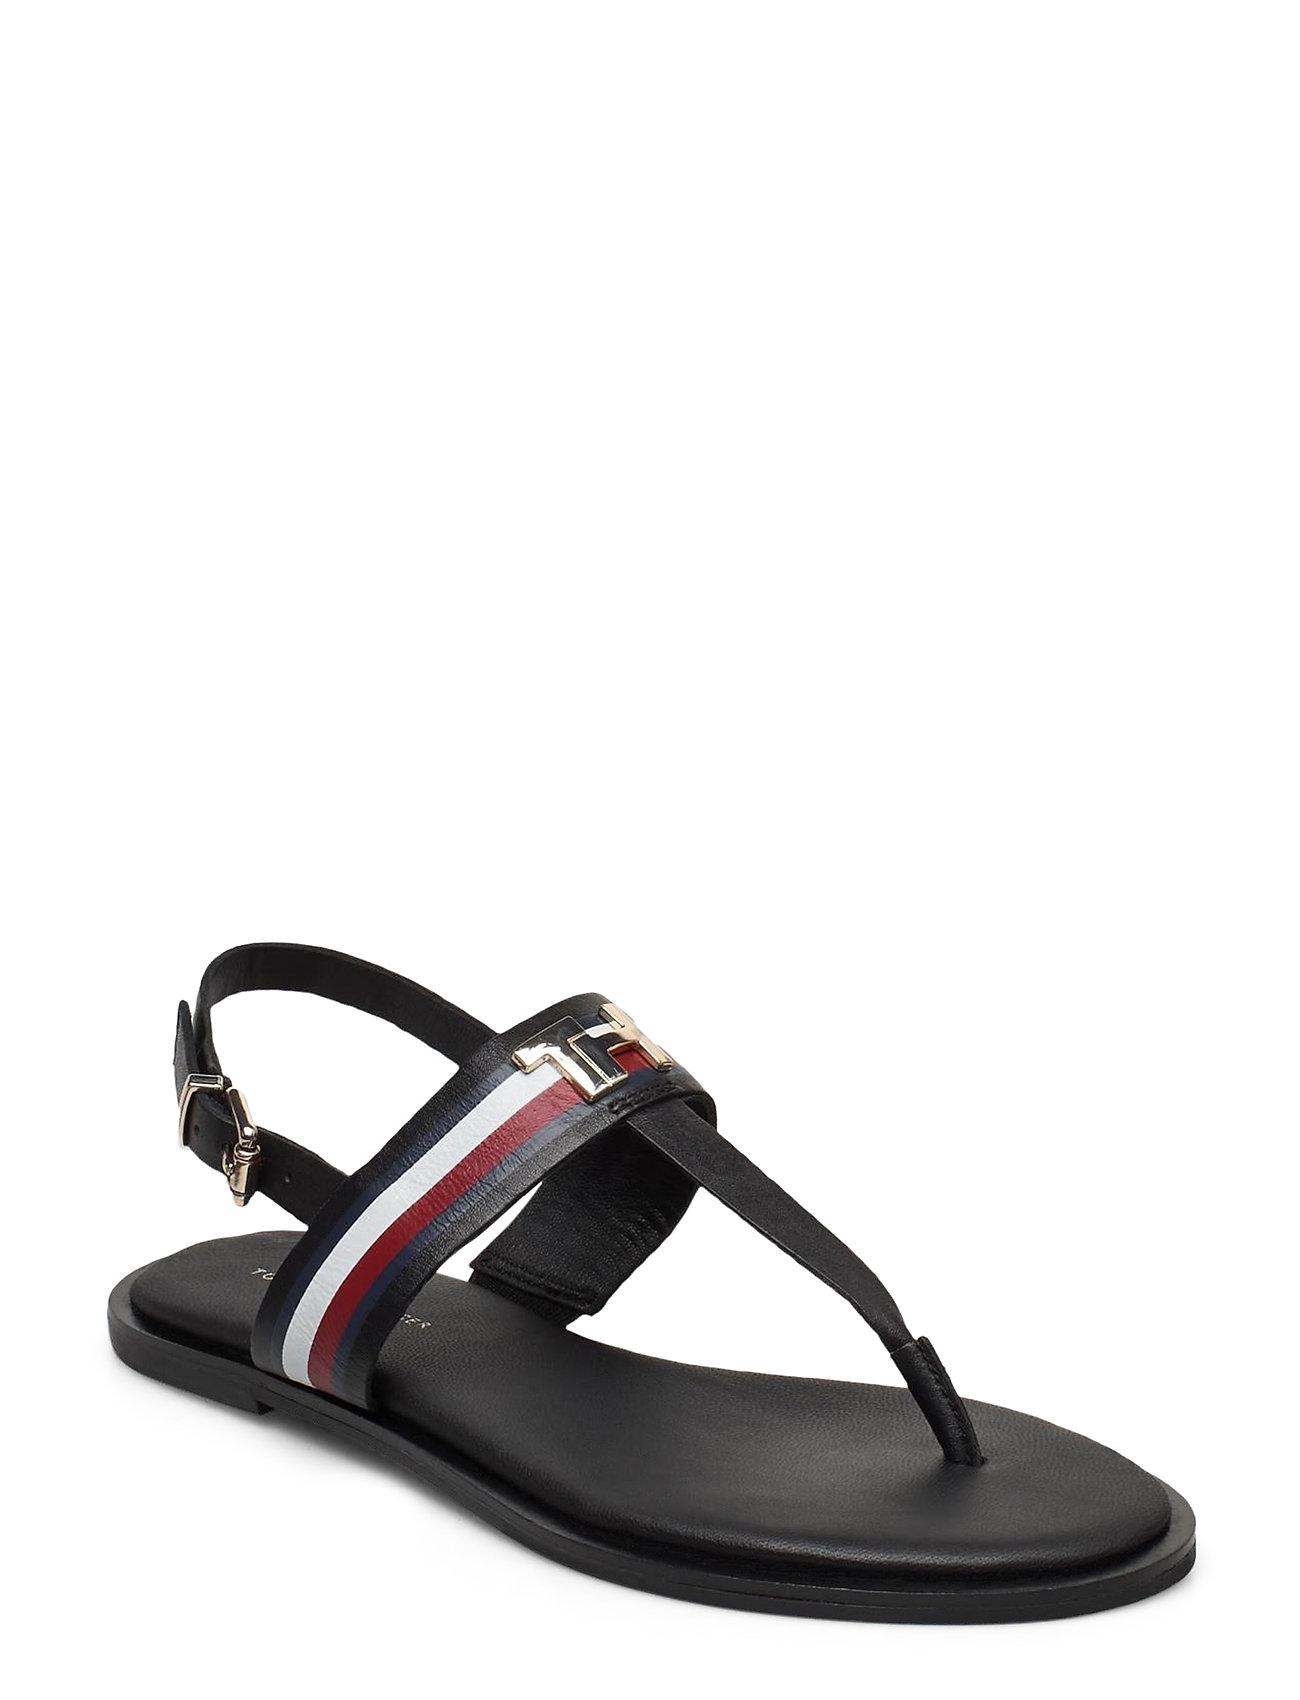 Image of Corporate Leather Flat Sandal Shoes Summer Shoes Flat Sandals Sort Tommy Hilfiger (3406310017)